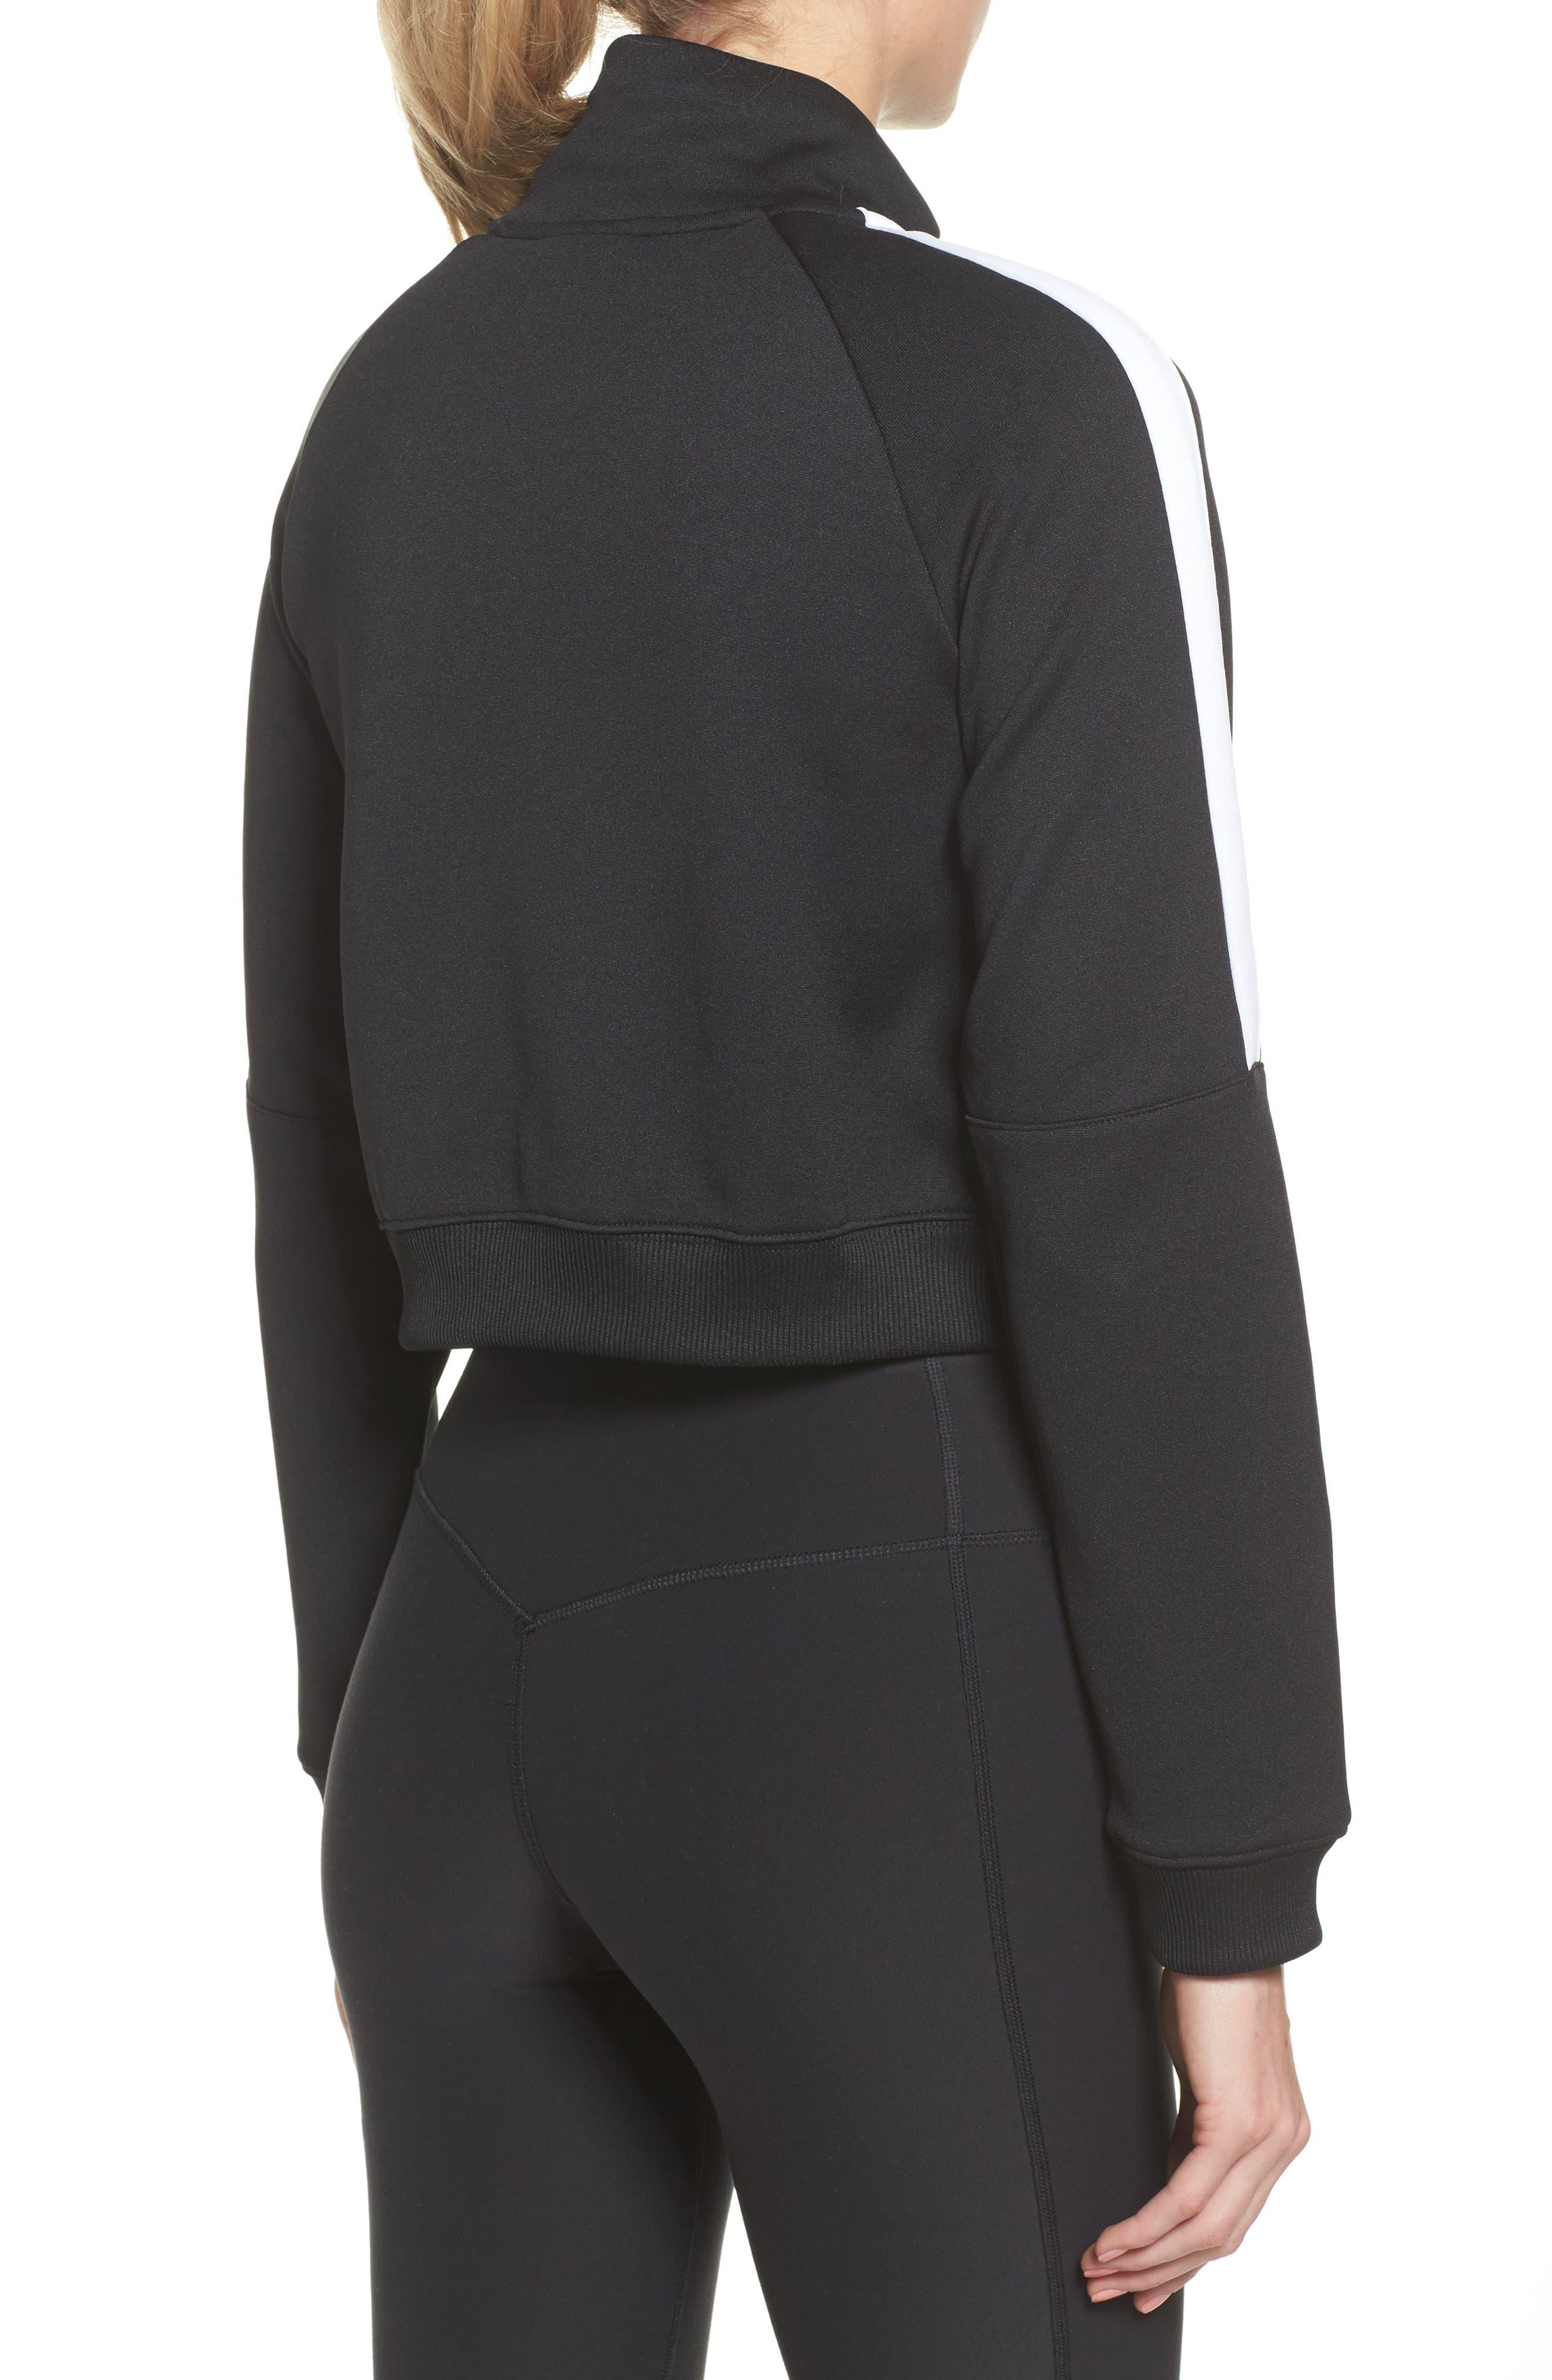 Sportswear N98 Jacket,                             Alternate thumbnail 2, color,                             Black/ White